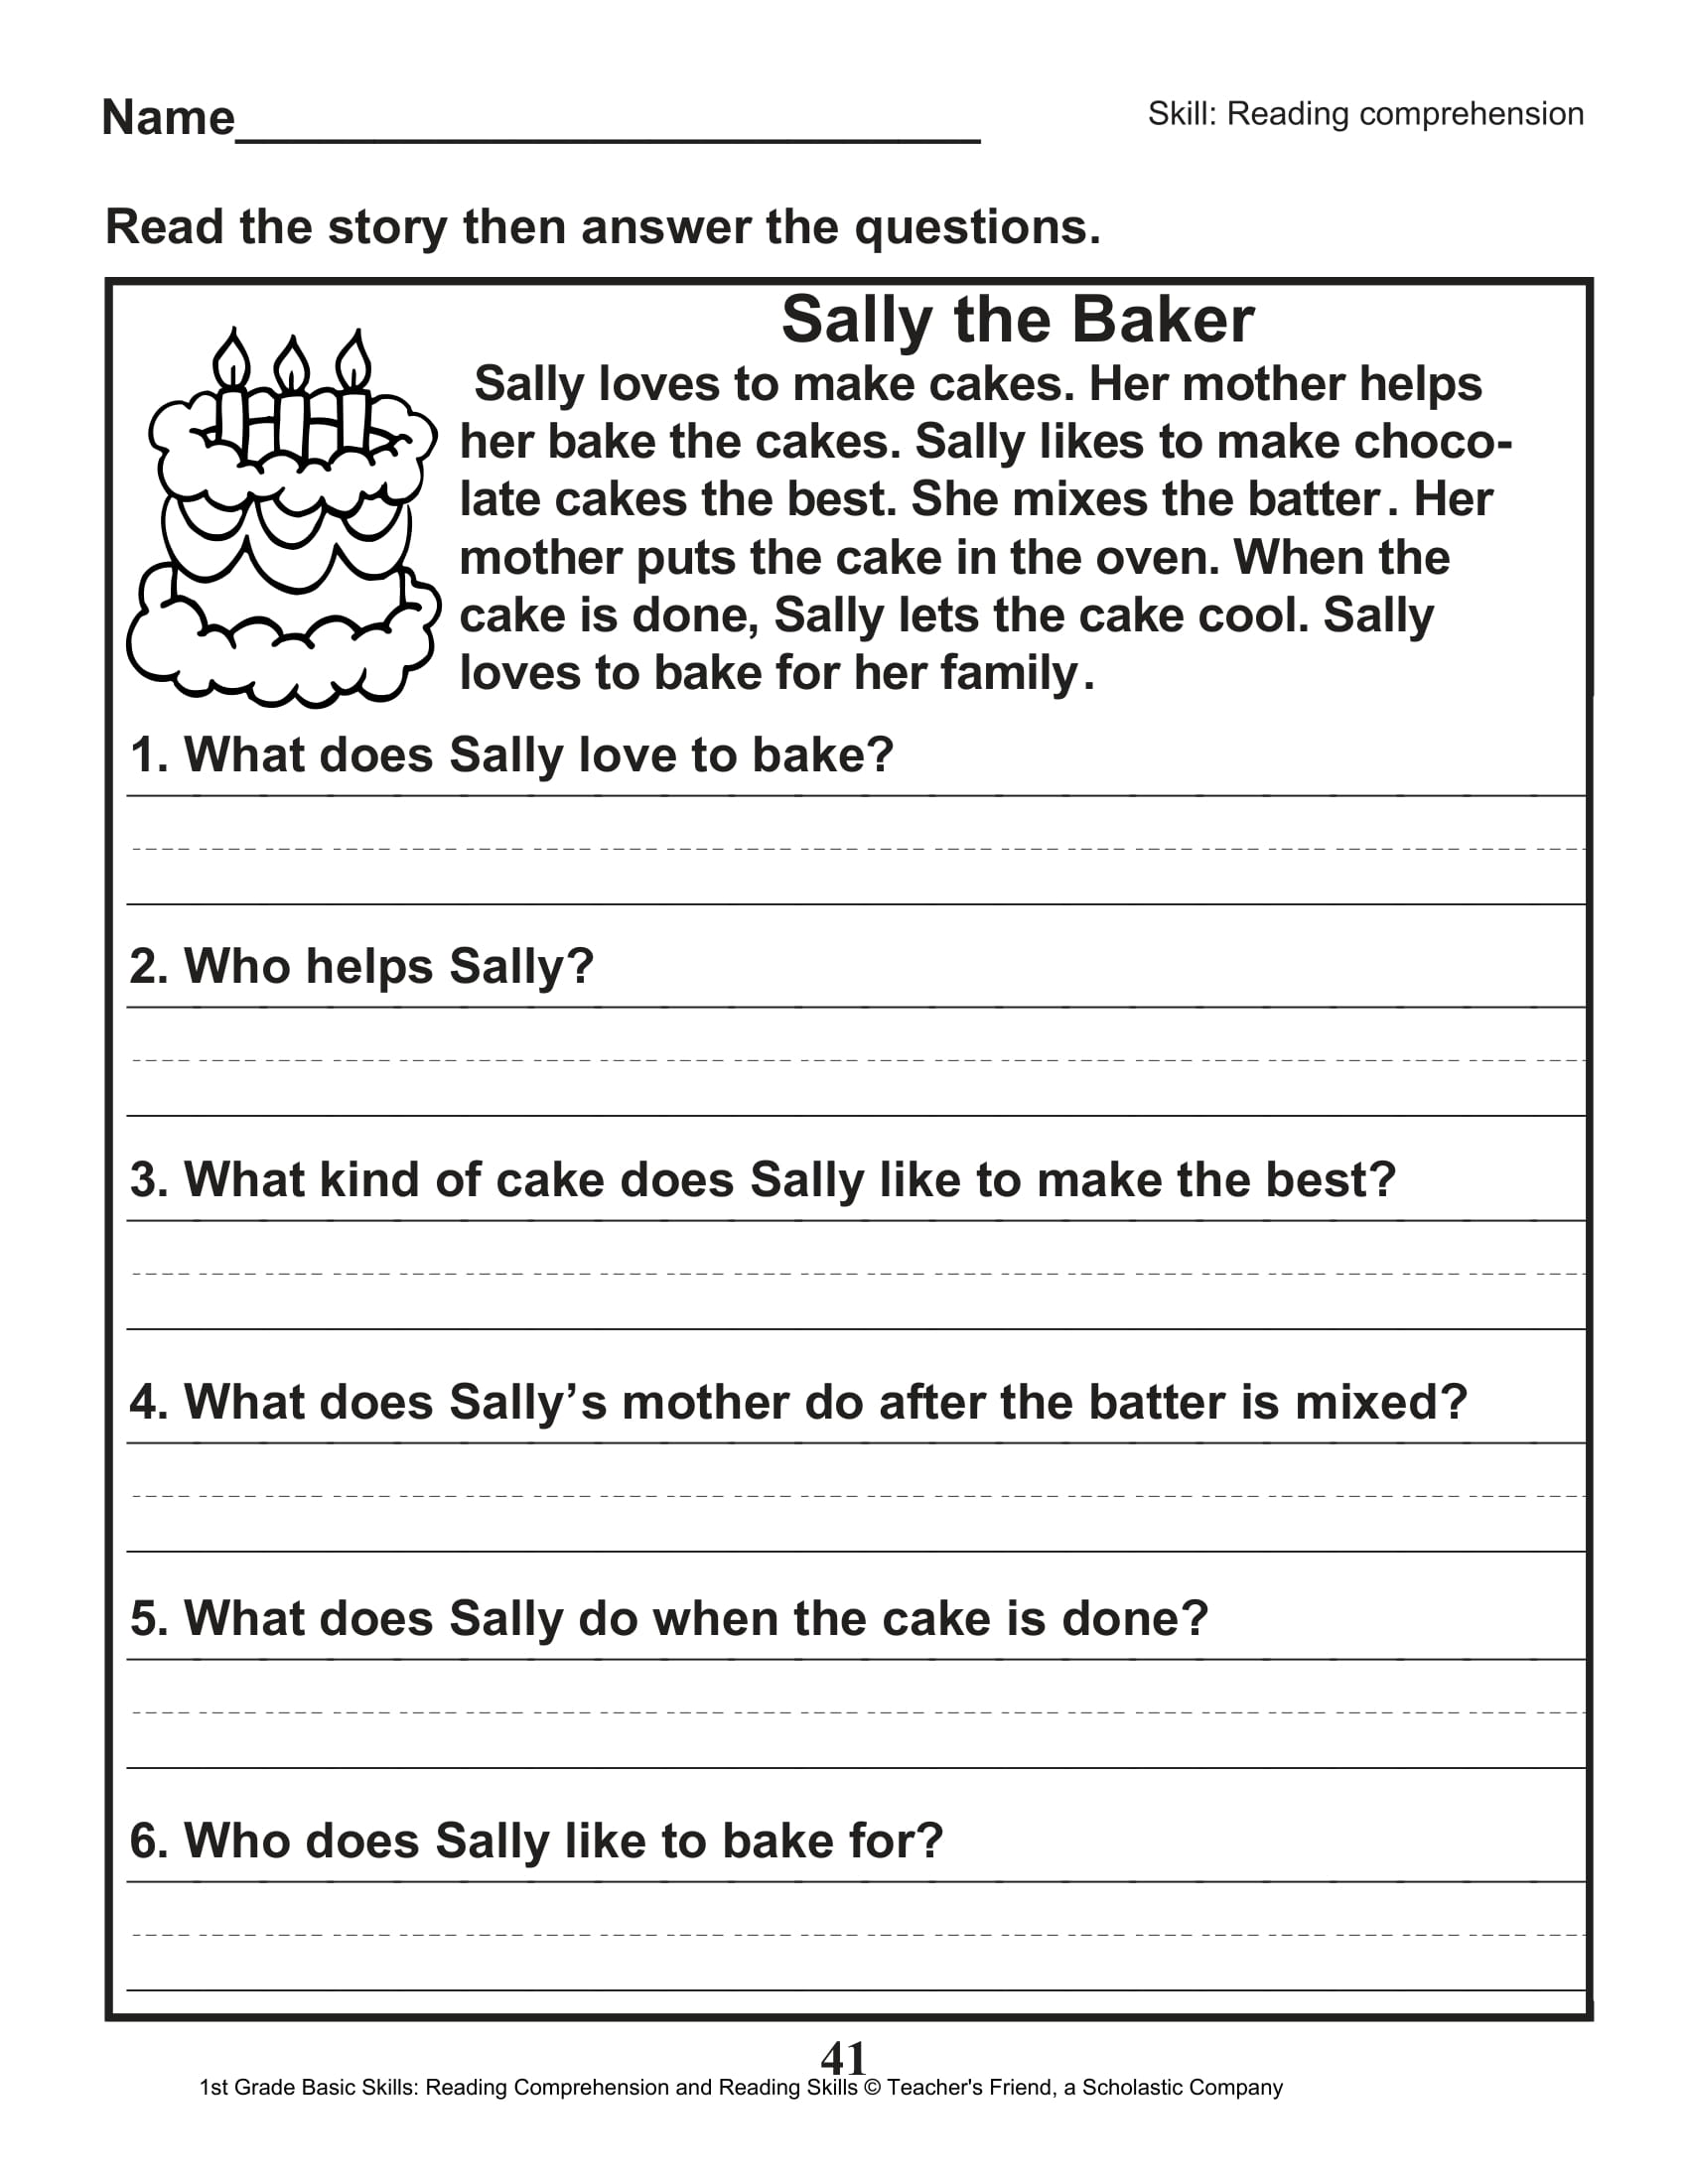 Scholastic 1st Grade Reading Comprehension Skills Worksheets 42